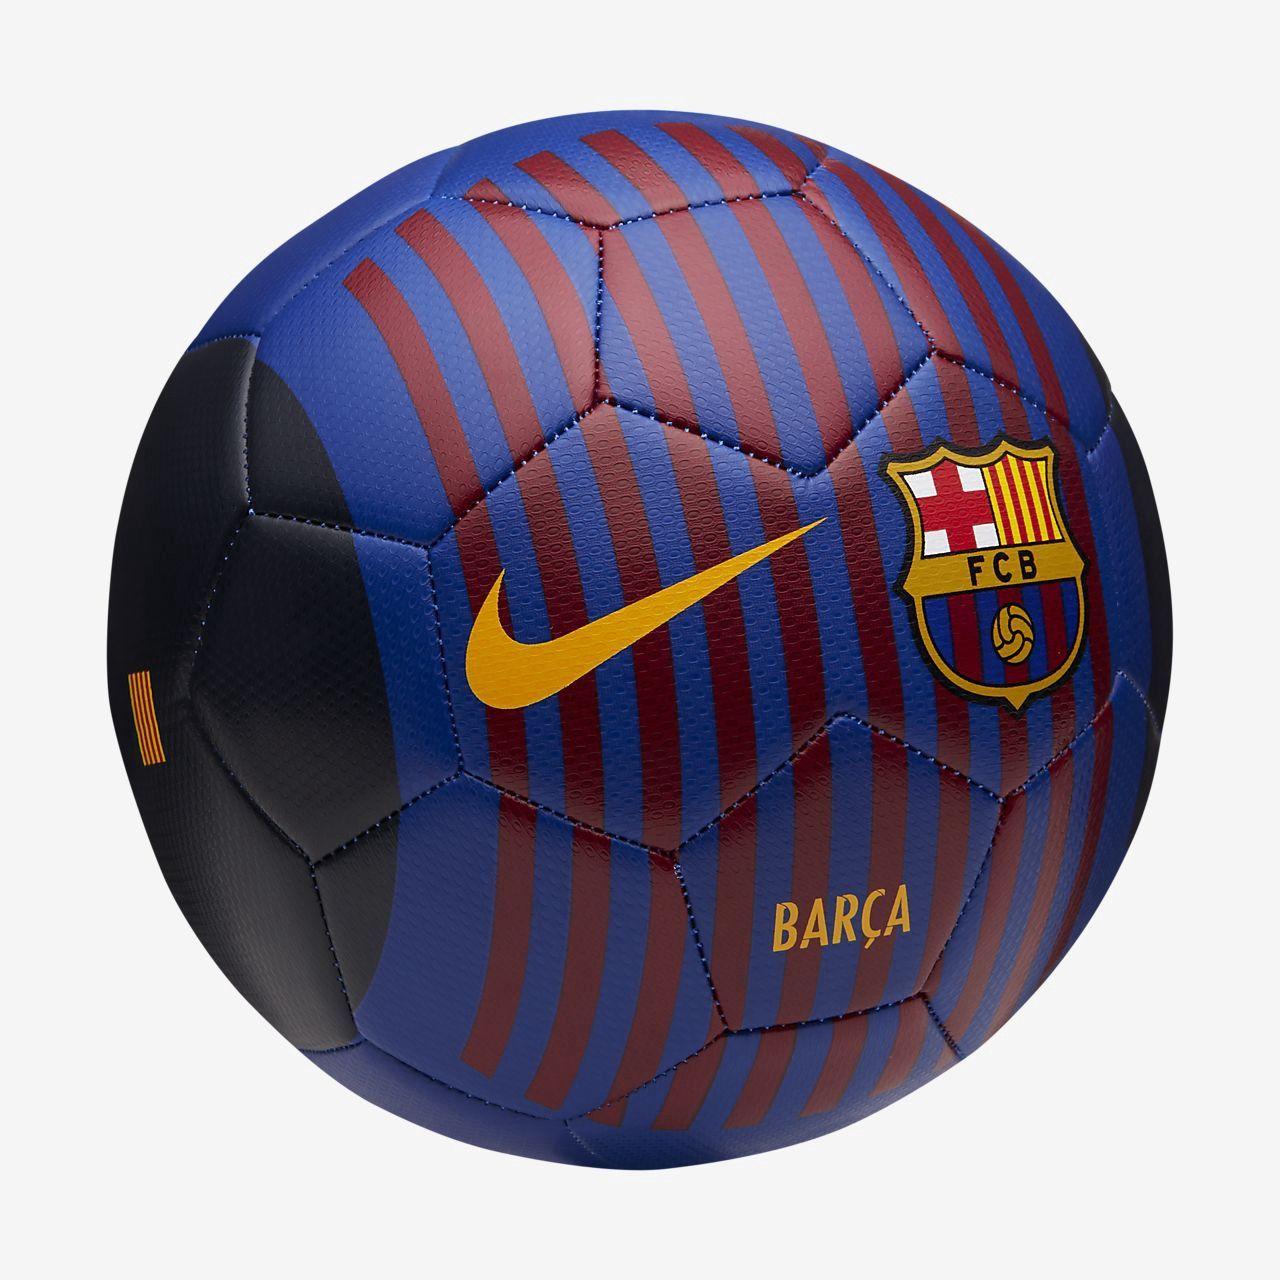 nike running app, El balón nike supporters ball fc barcelona